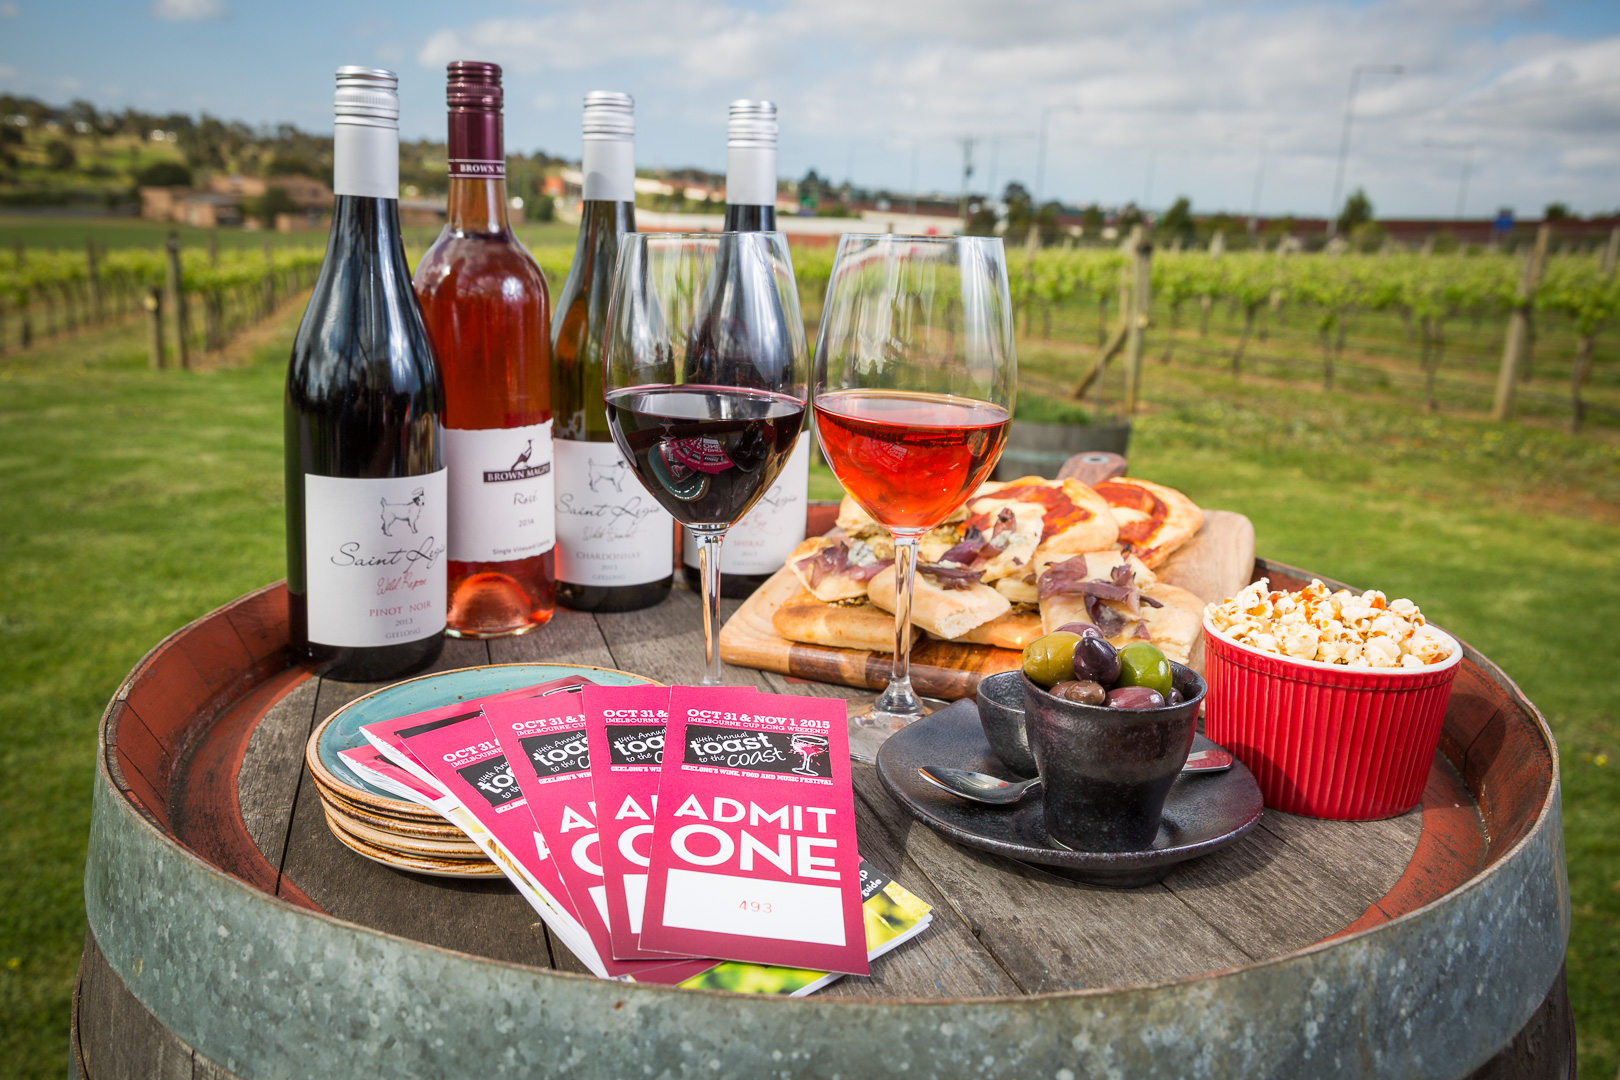 2015-10-13 - Wine Geelong - St Regis Launch-0643.jpg